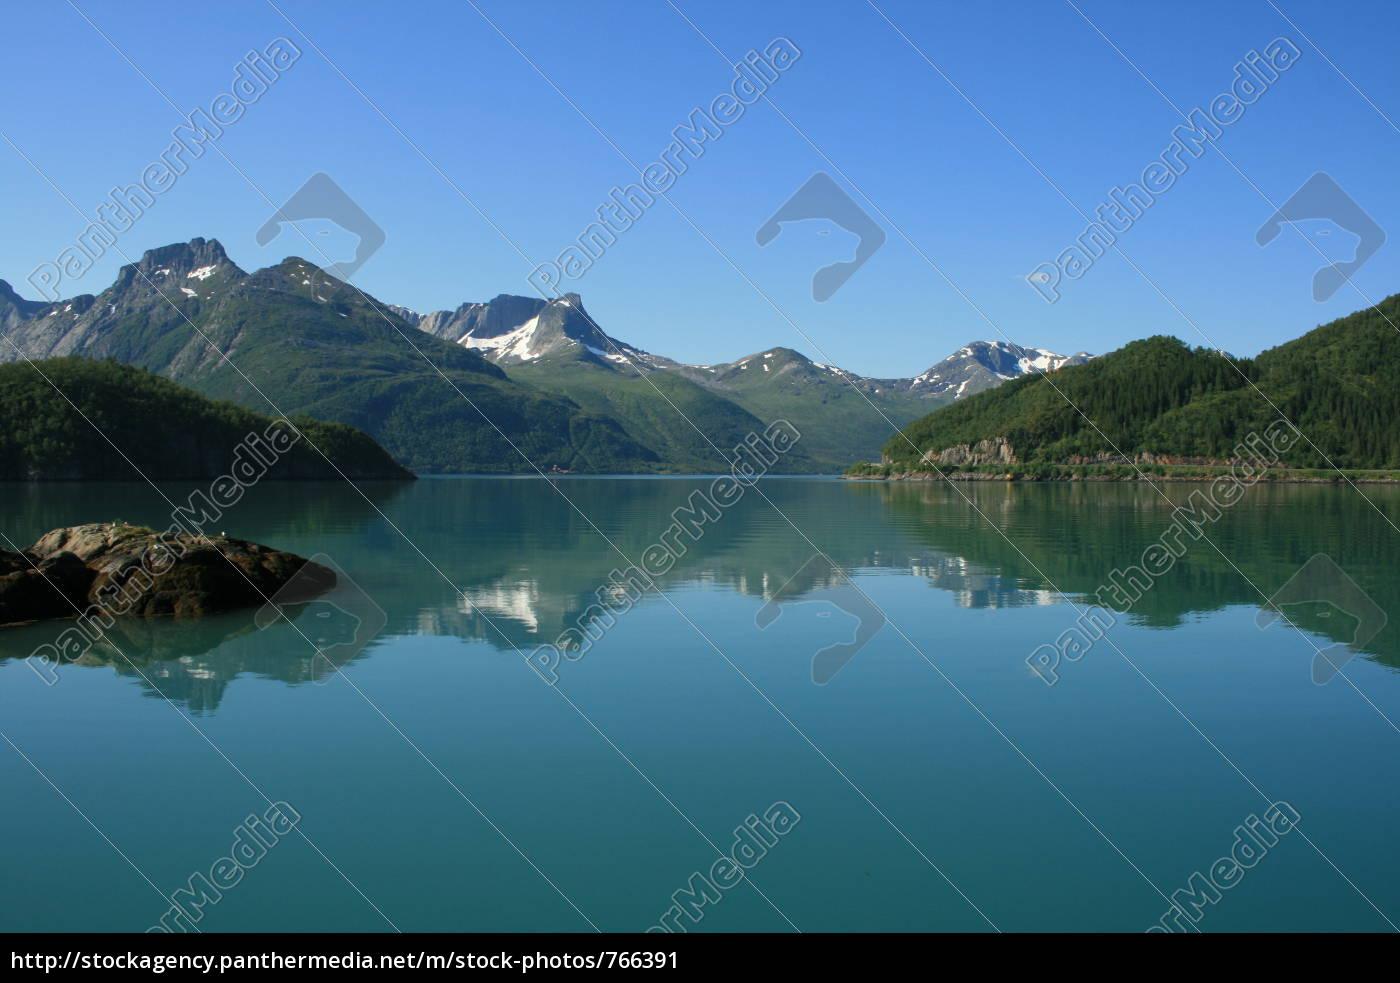 norwegian, fjords - 766391